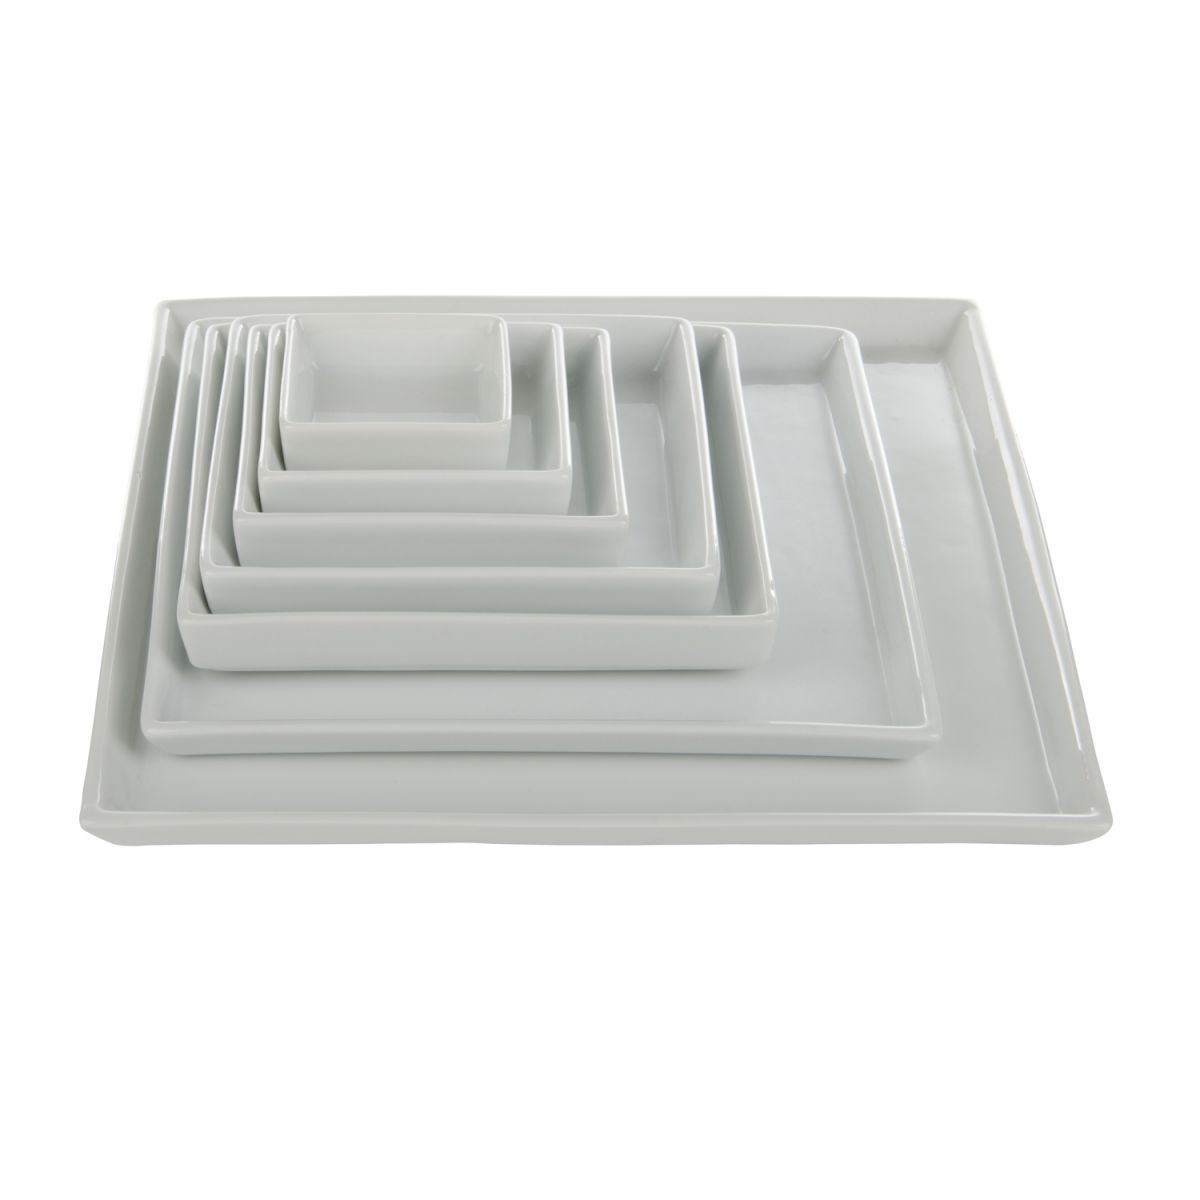 bord porselein vierkant wit 8x8cmbox 12